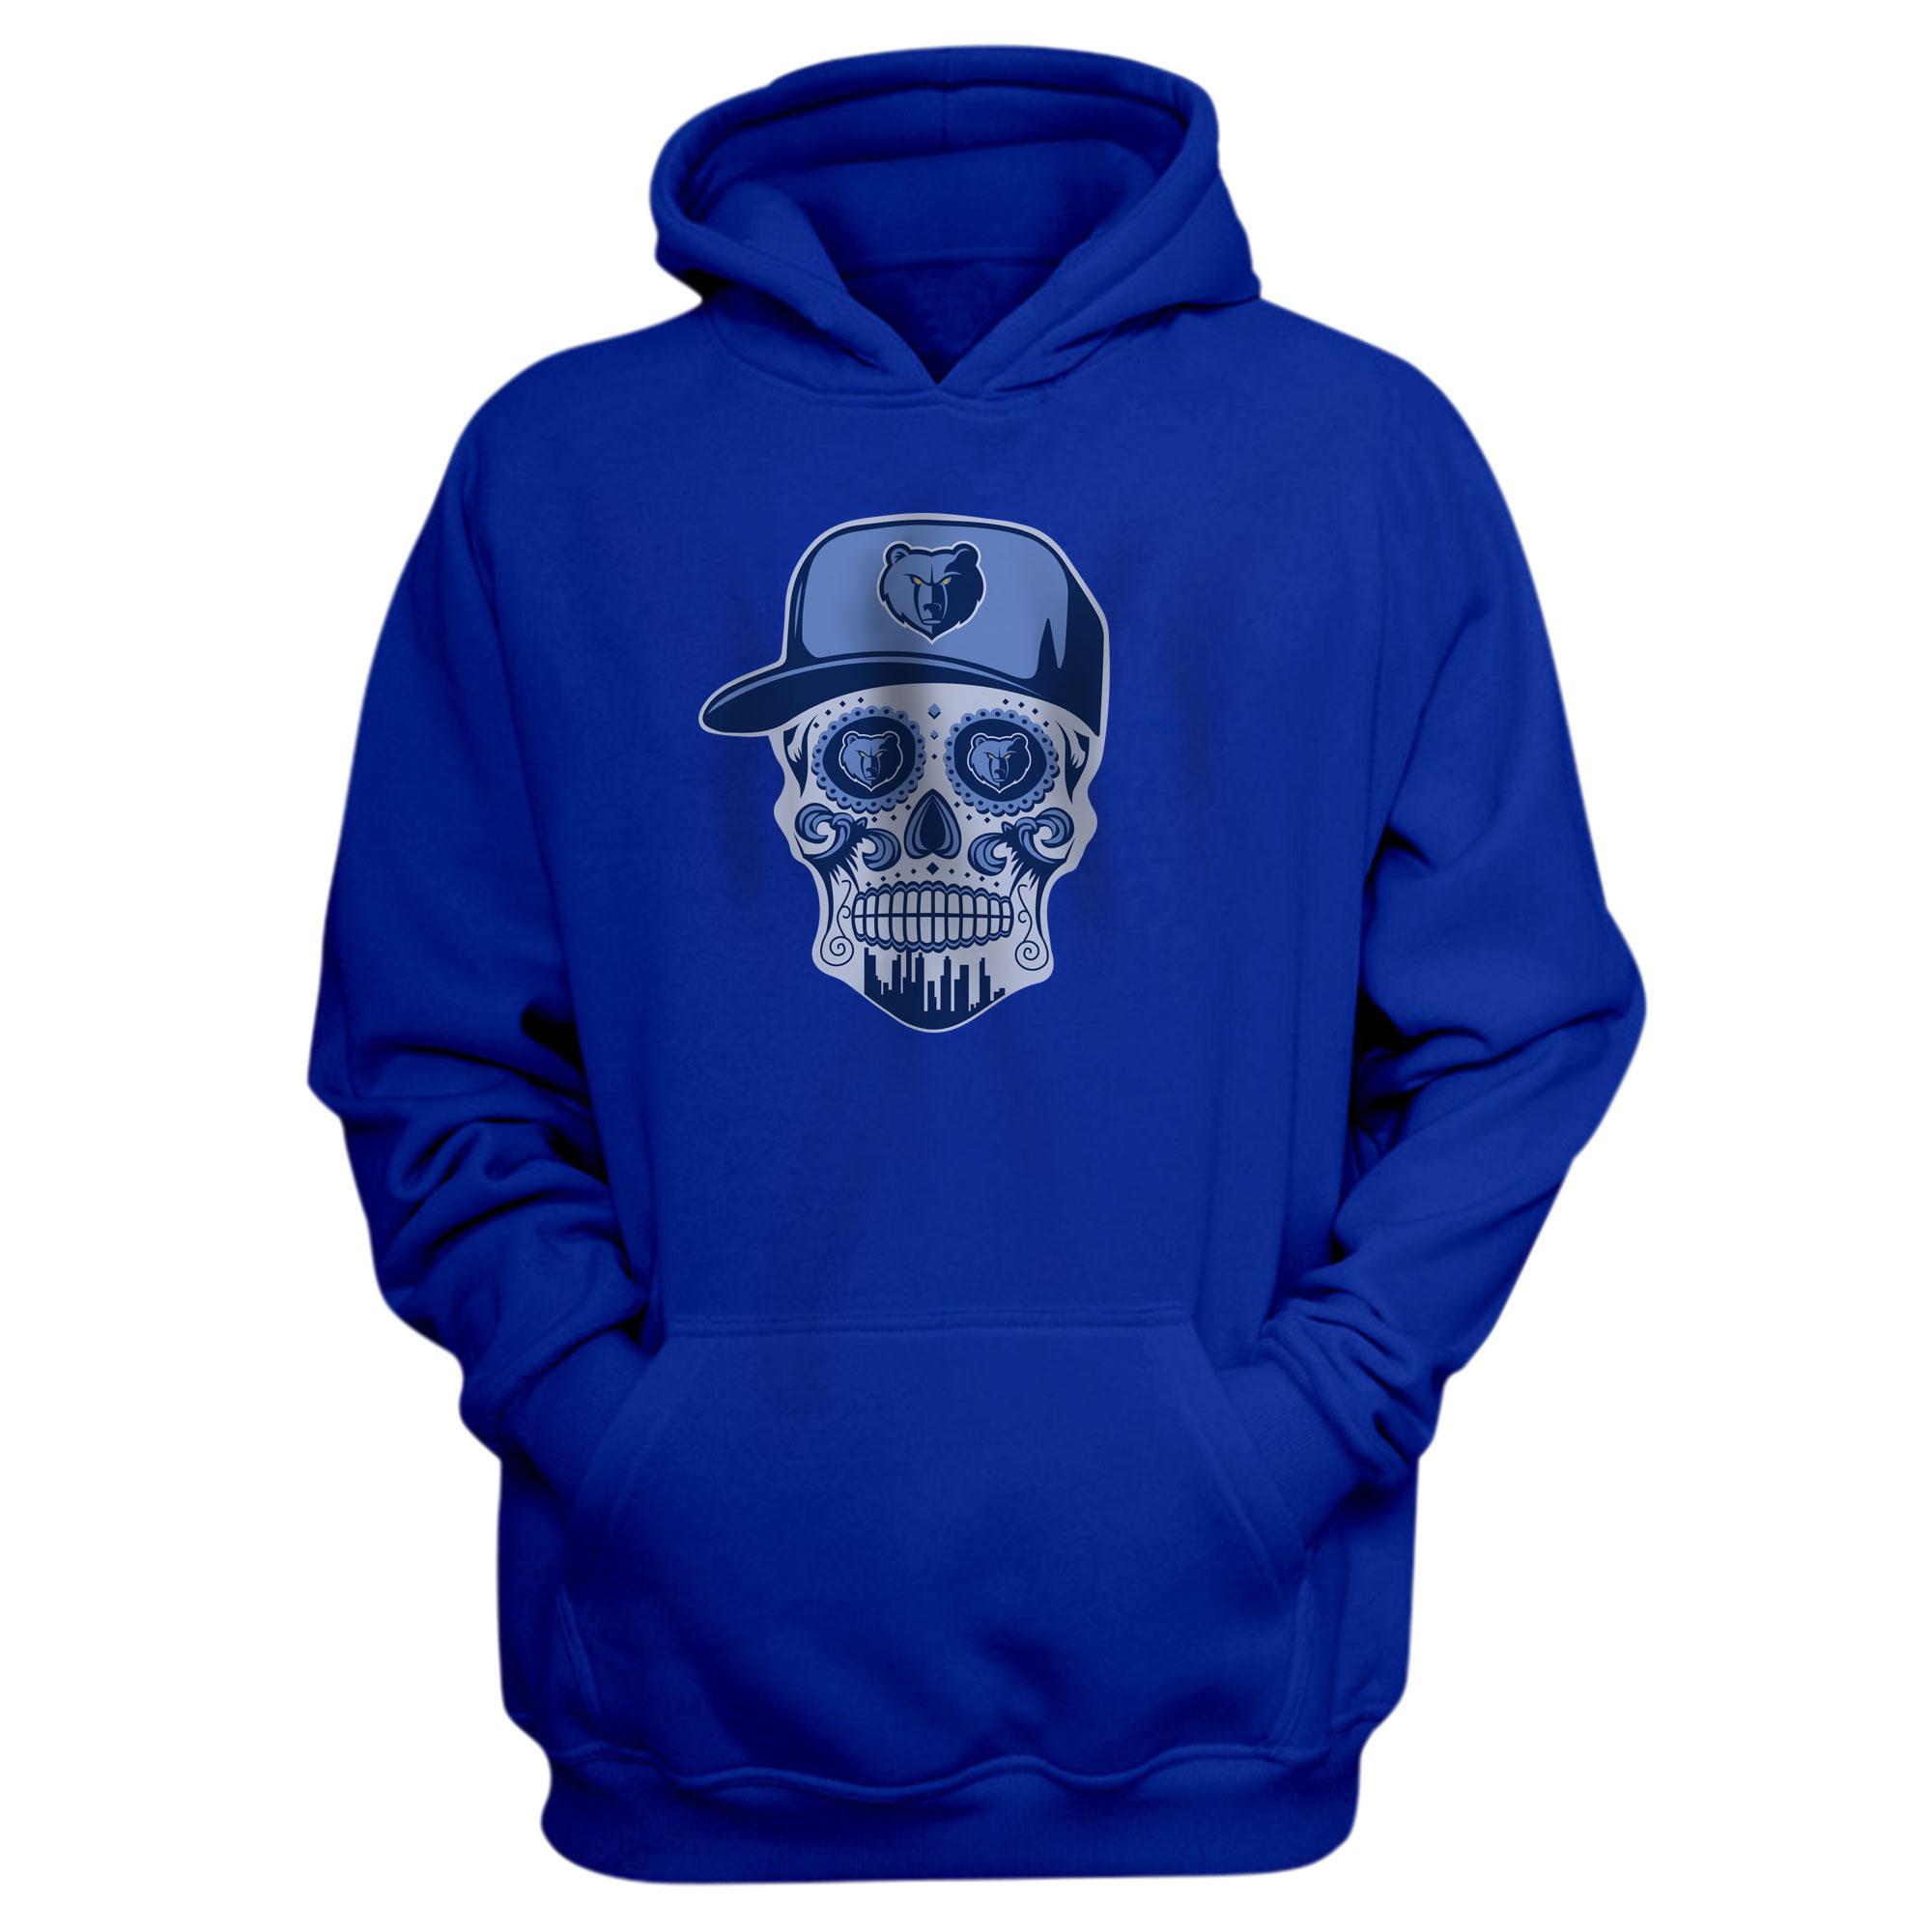 Memphis Skull Hoodie (HD-BLU-NP-455-NBA-MEM-SKULL)